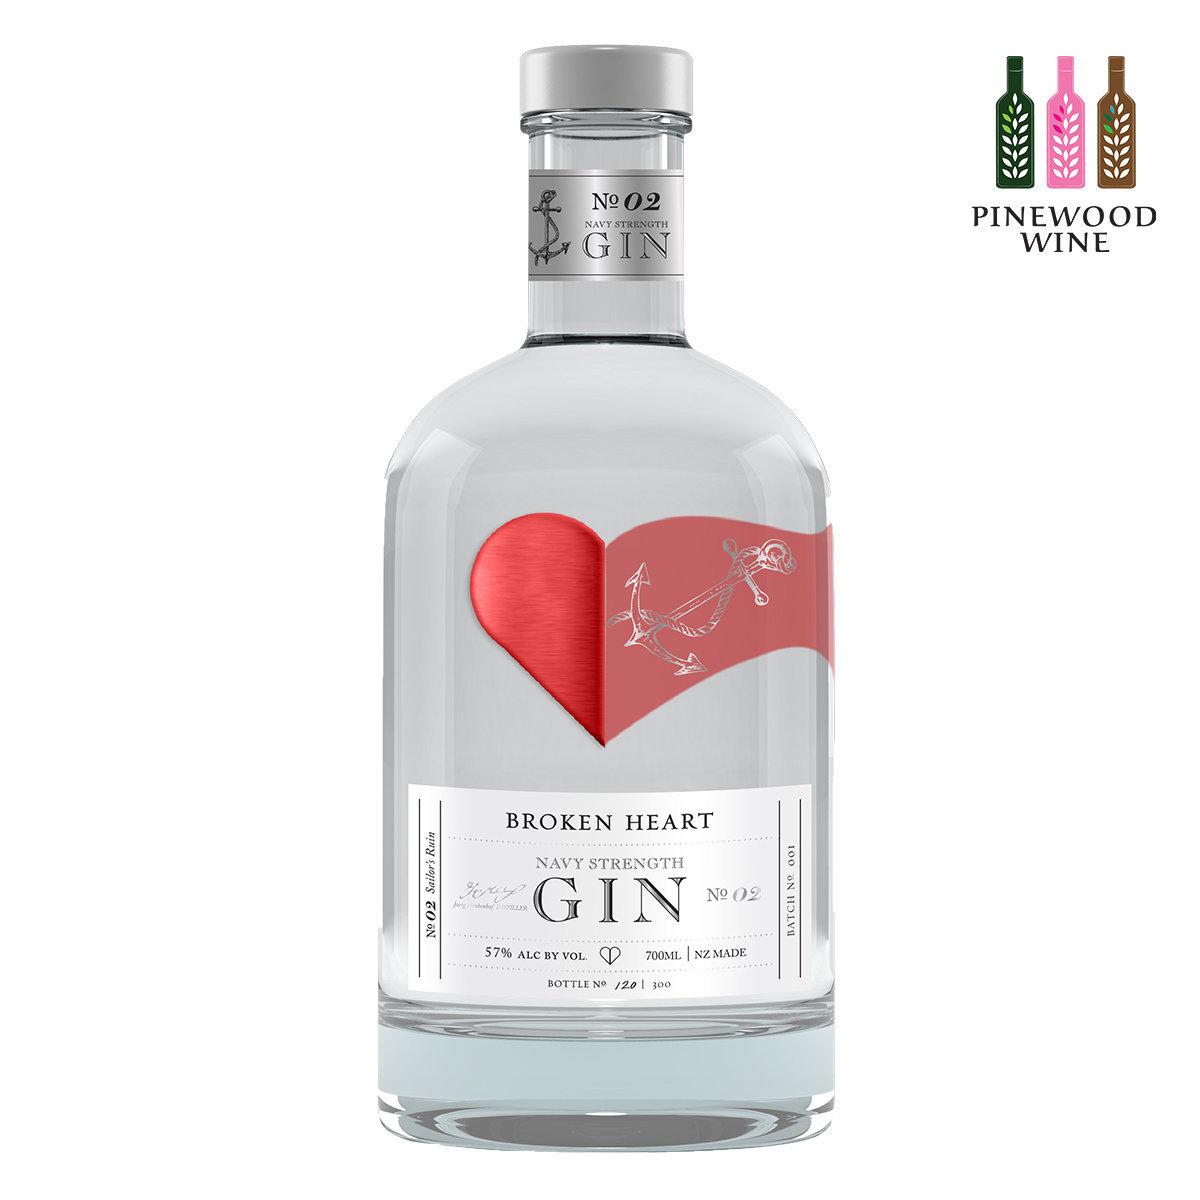 NAVY Strength Gin 57% alc. 700ml